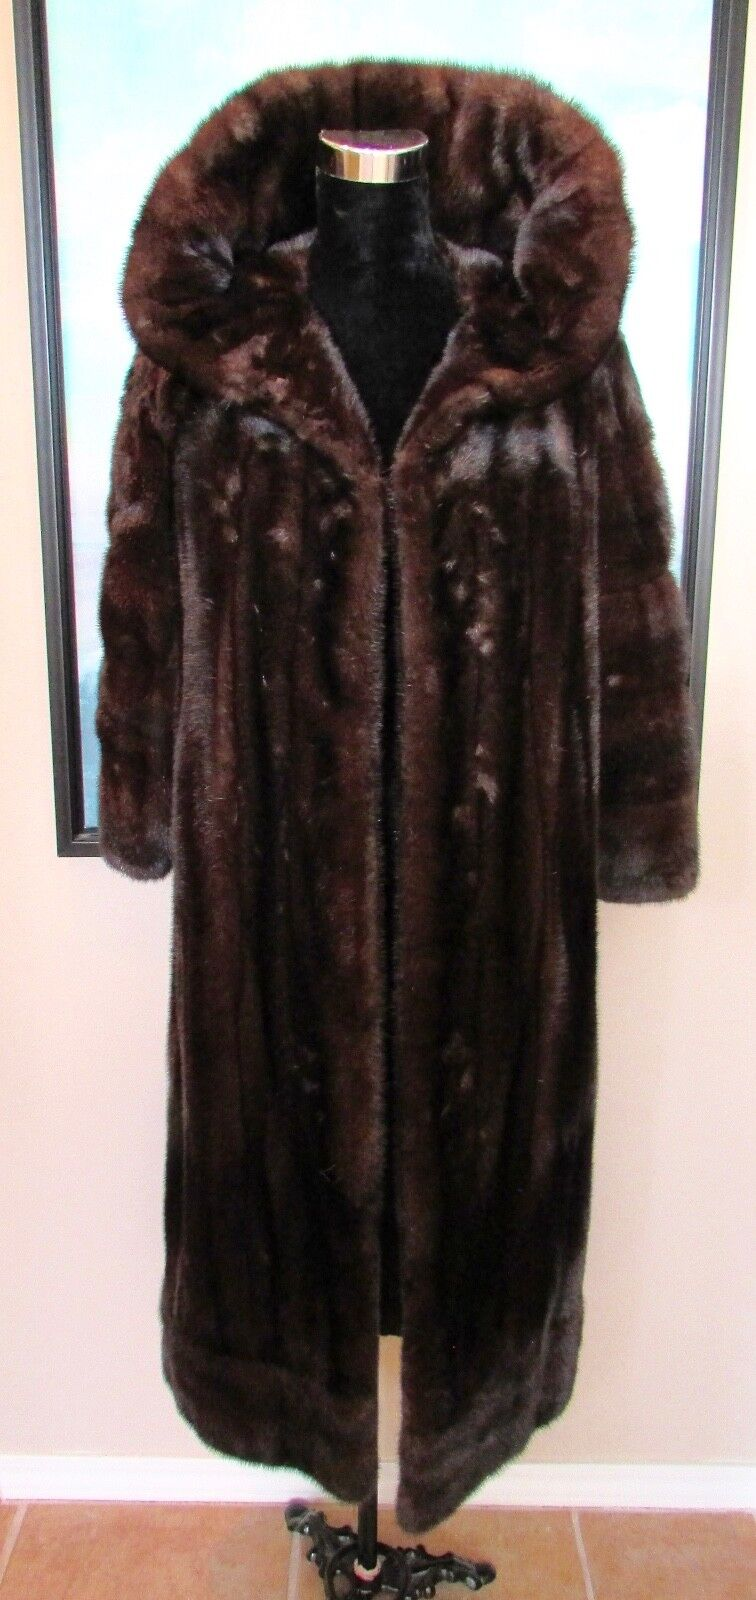 REVILLON SAKS FIFTH AVE Brown Full Length Mink Coat Dramatic Collar Sz XS S